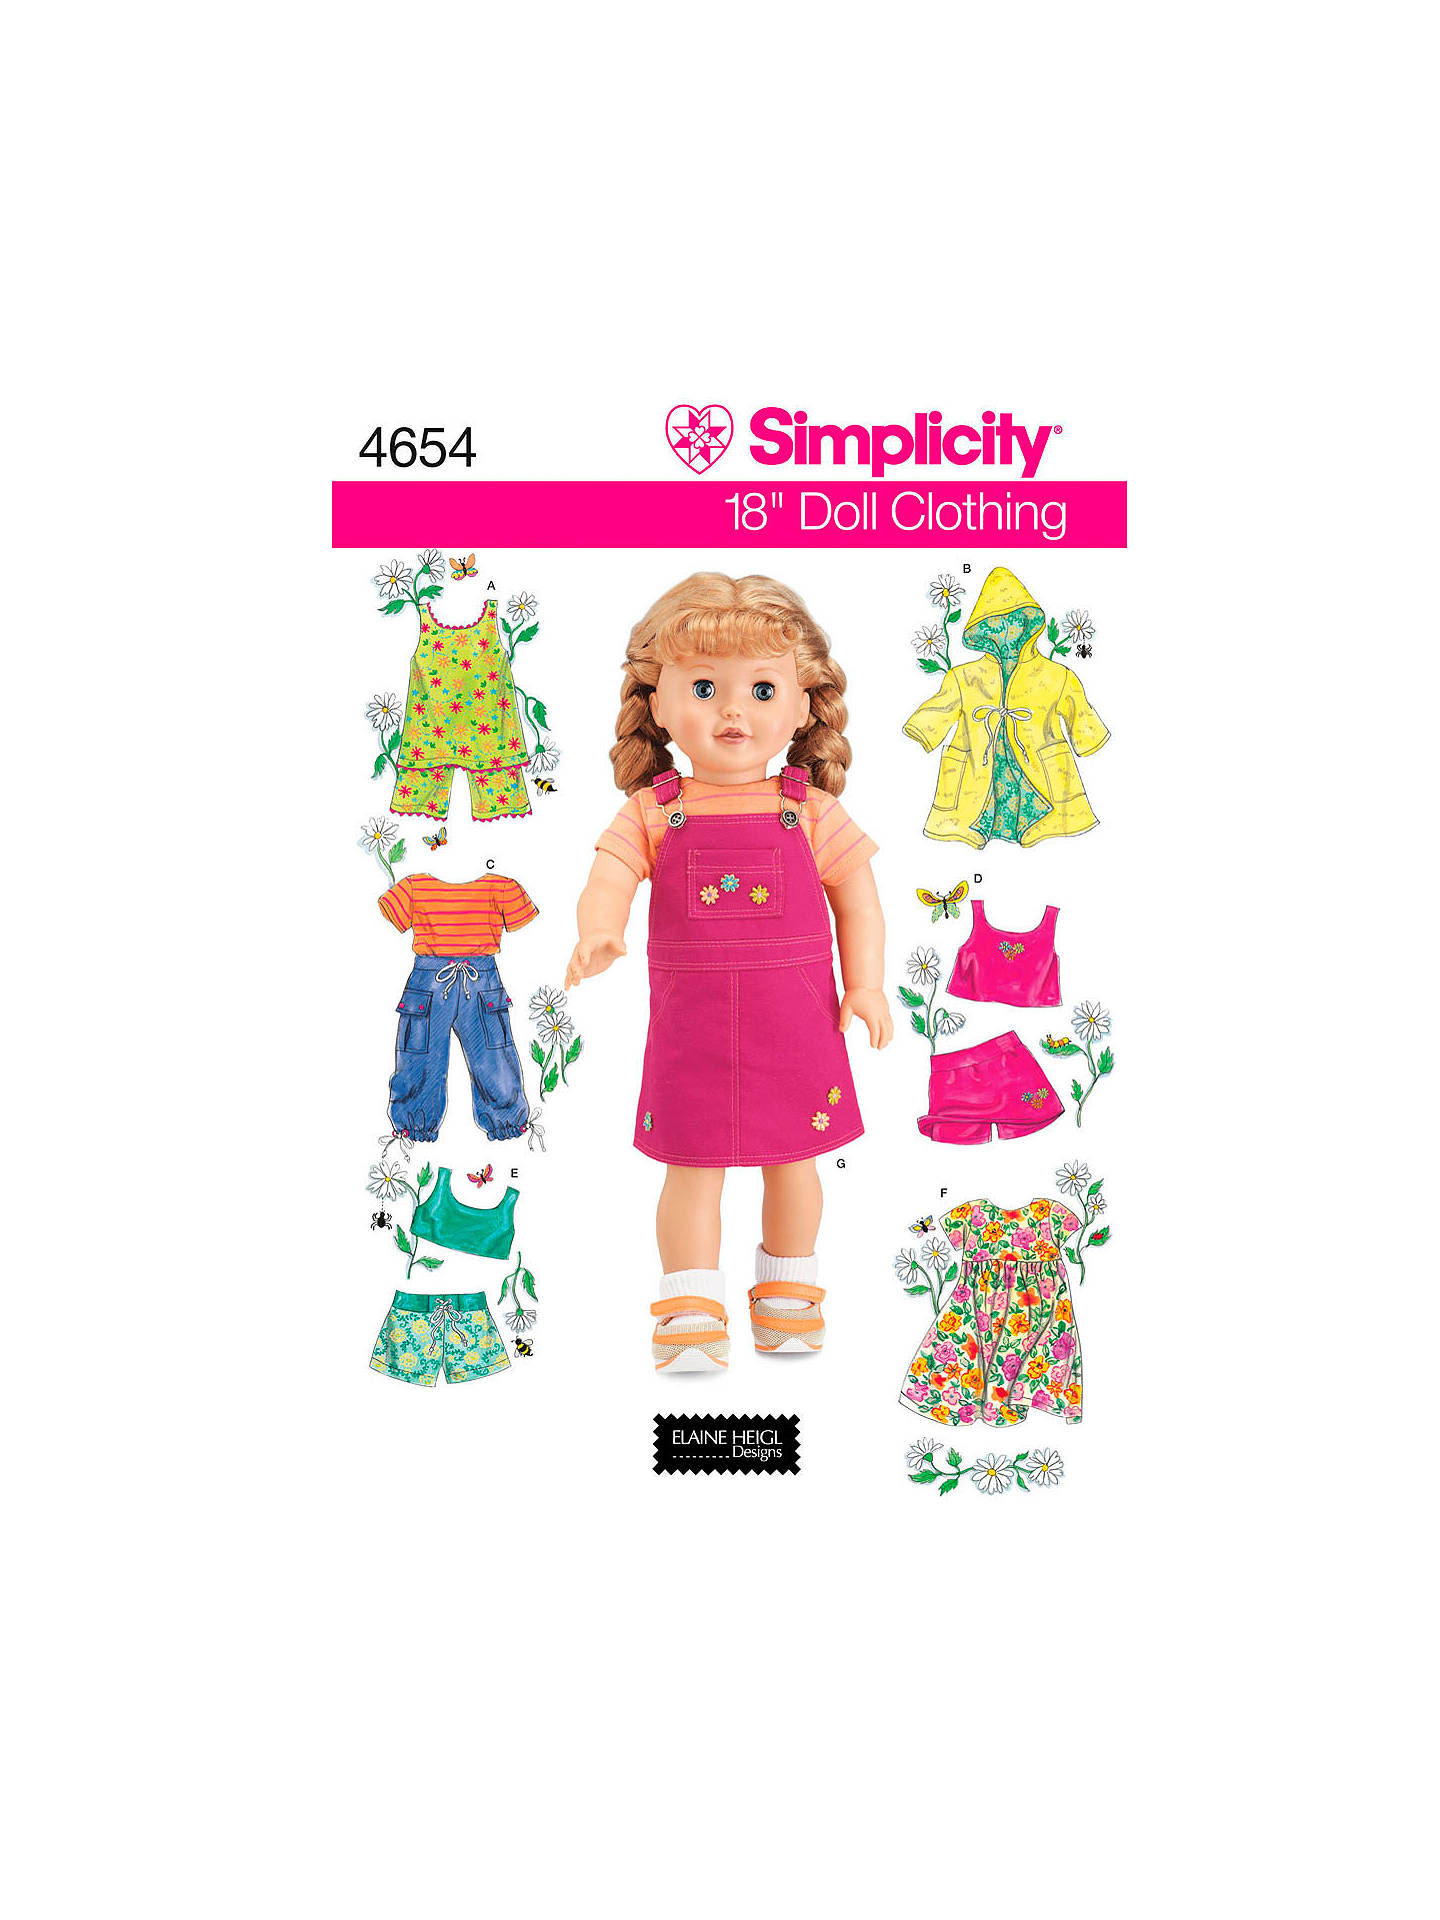 Simplicity Craft Sewing Pattern, 4654 at John Lewis & Partners